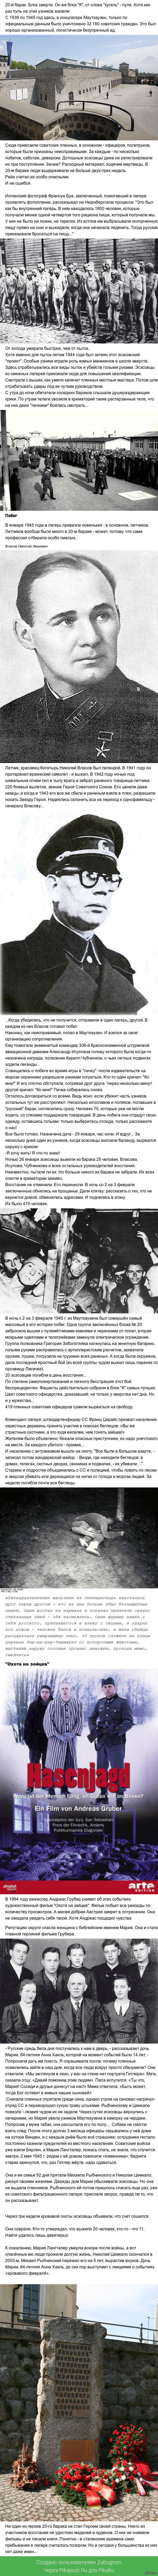 http://cs4.pikabu.ru/post_img/2015/04/16/3/1429150134_1760025486.jpg